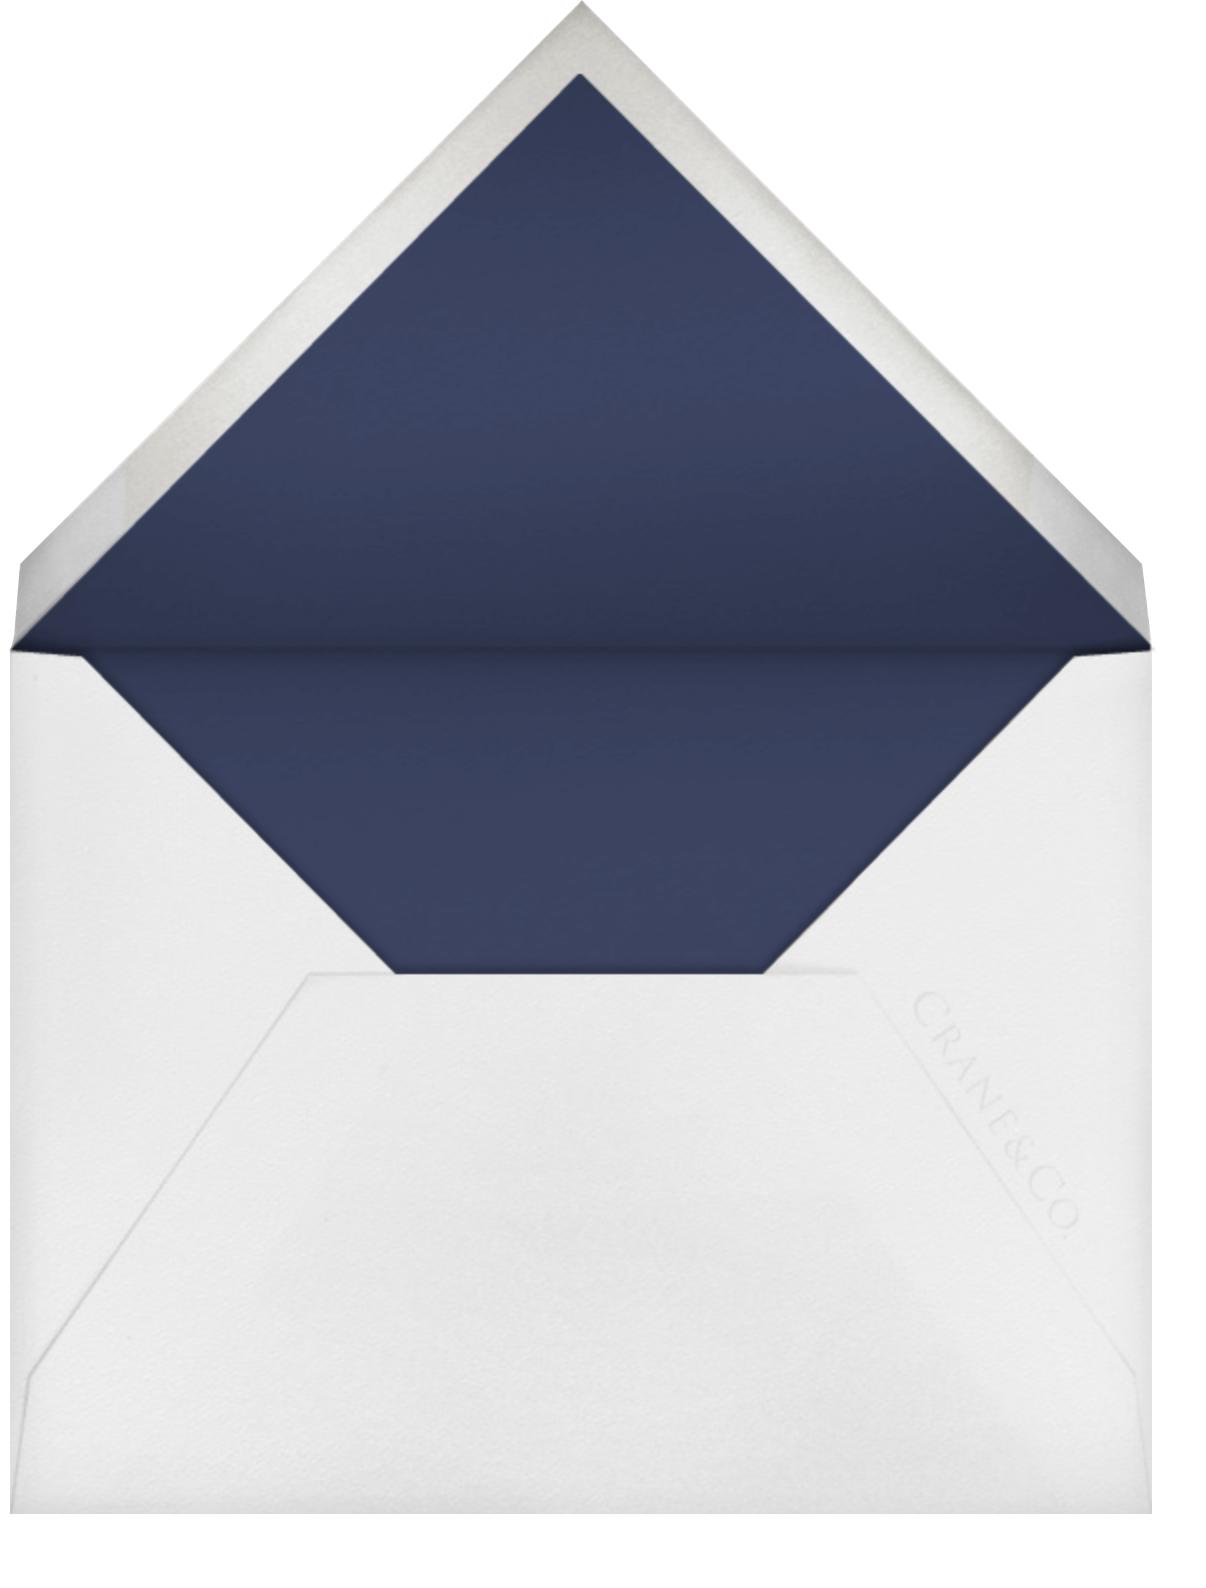 Hydrangea Lace II (Thank You) - Navy - Oscar de la Renta - Envelope